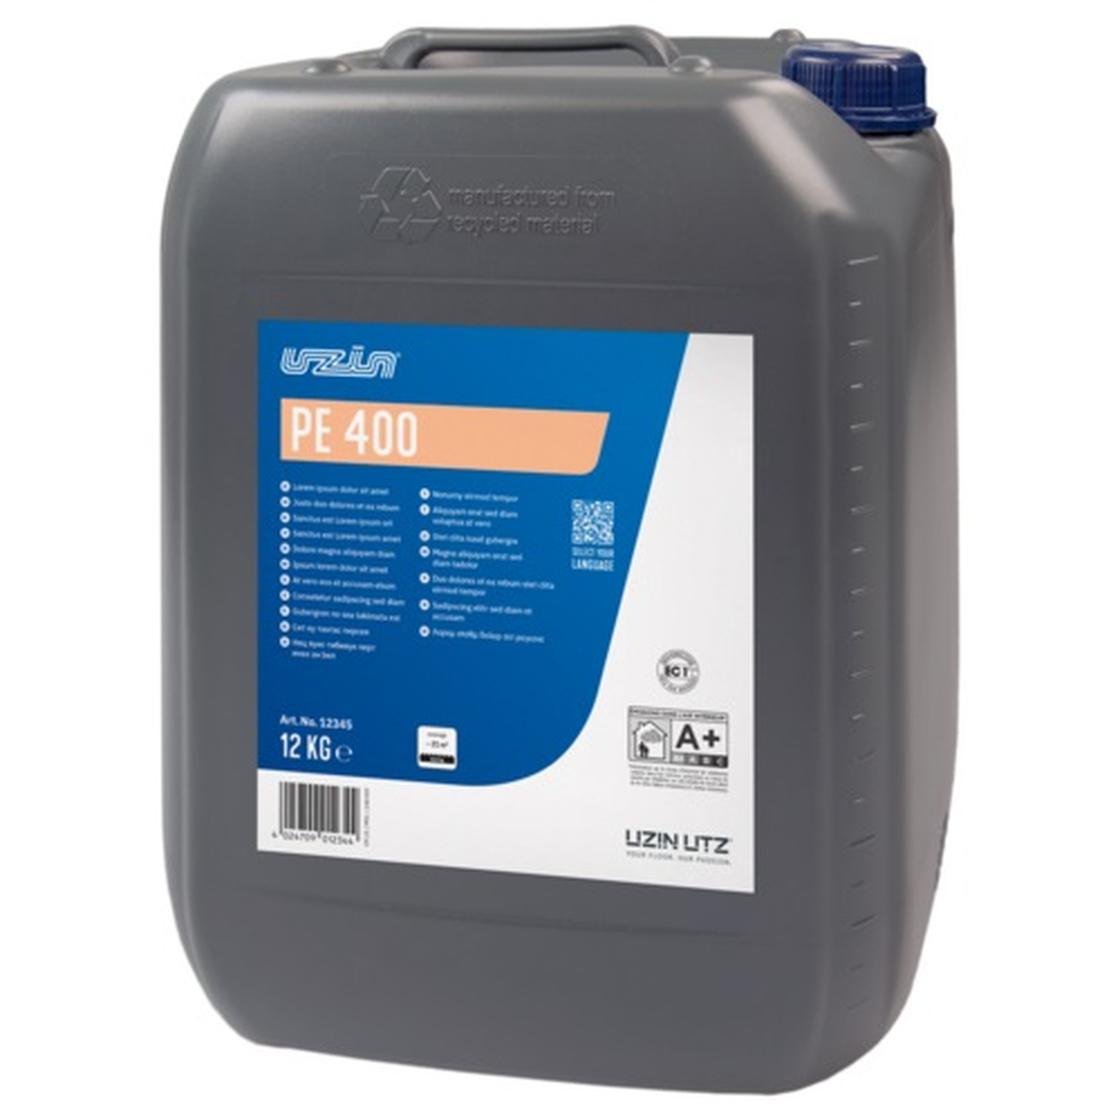 Uzin PE 400 Dispersions-Feuchtesperre   günstig kaufen